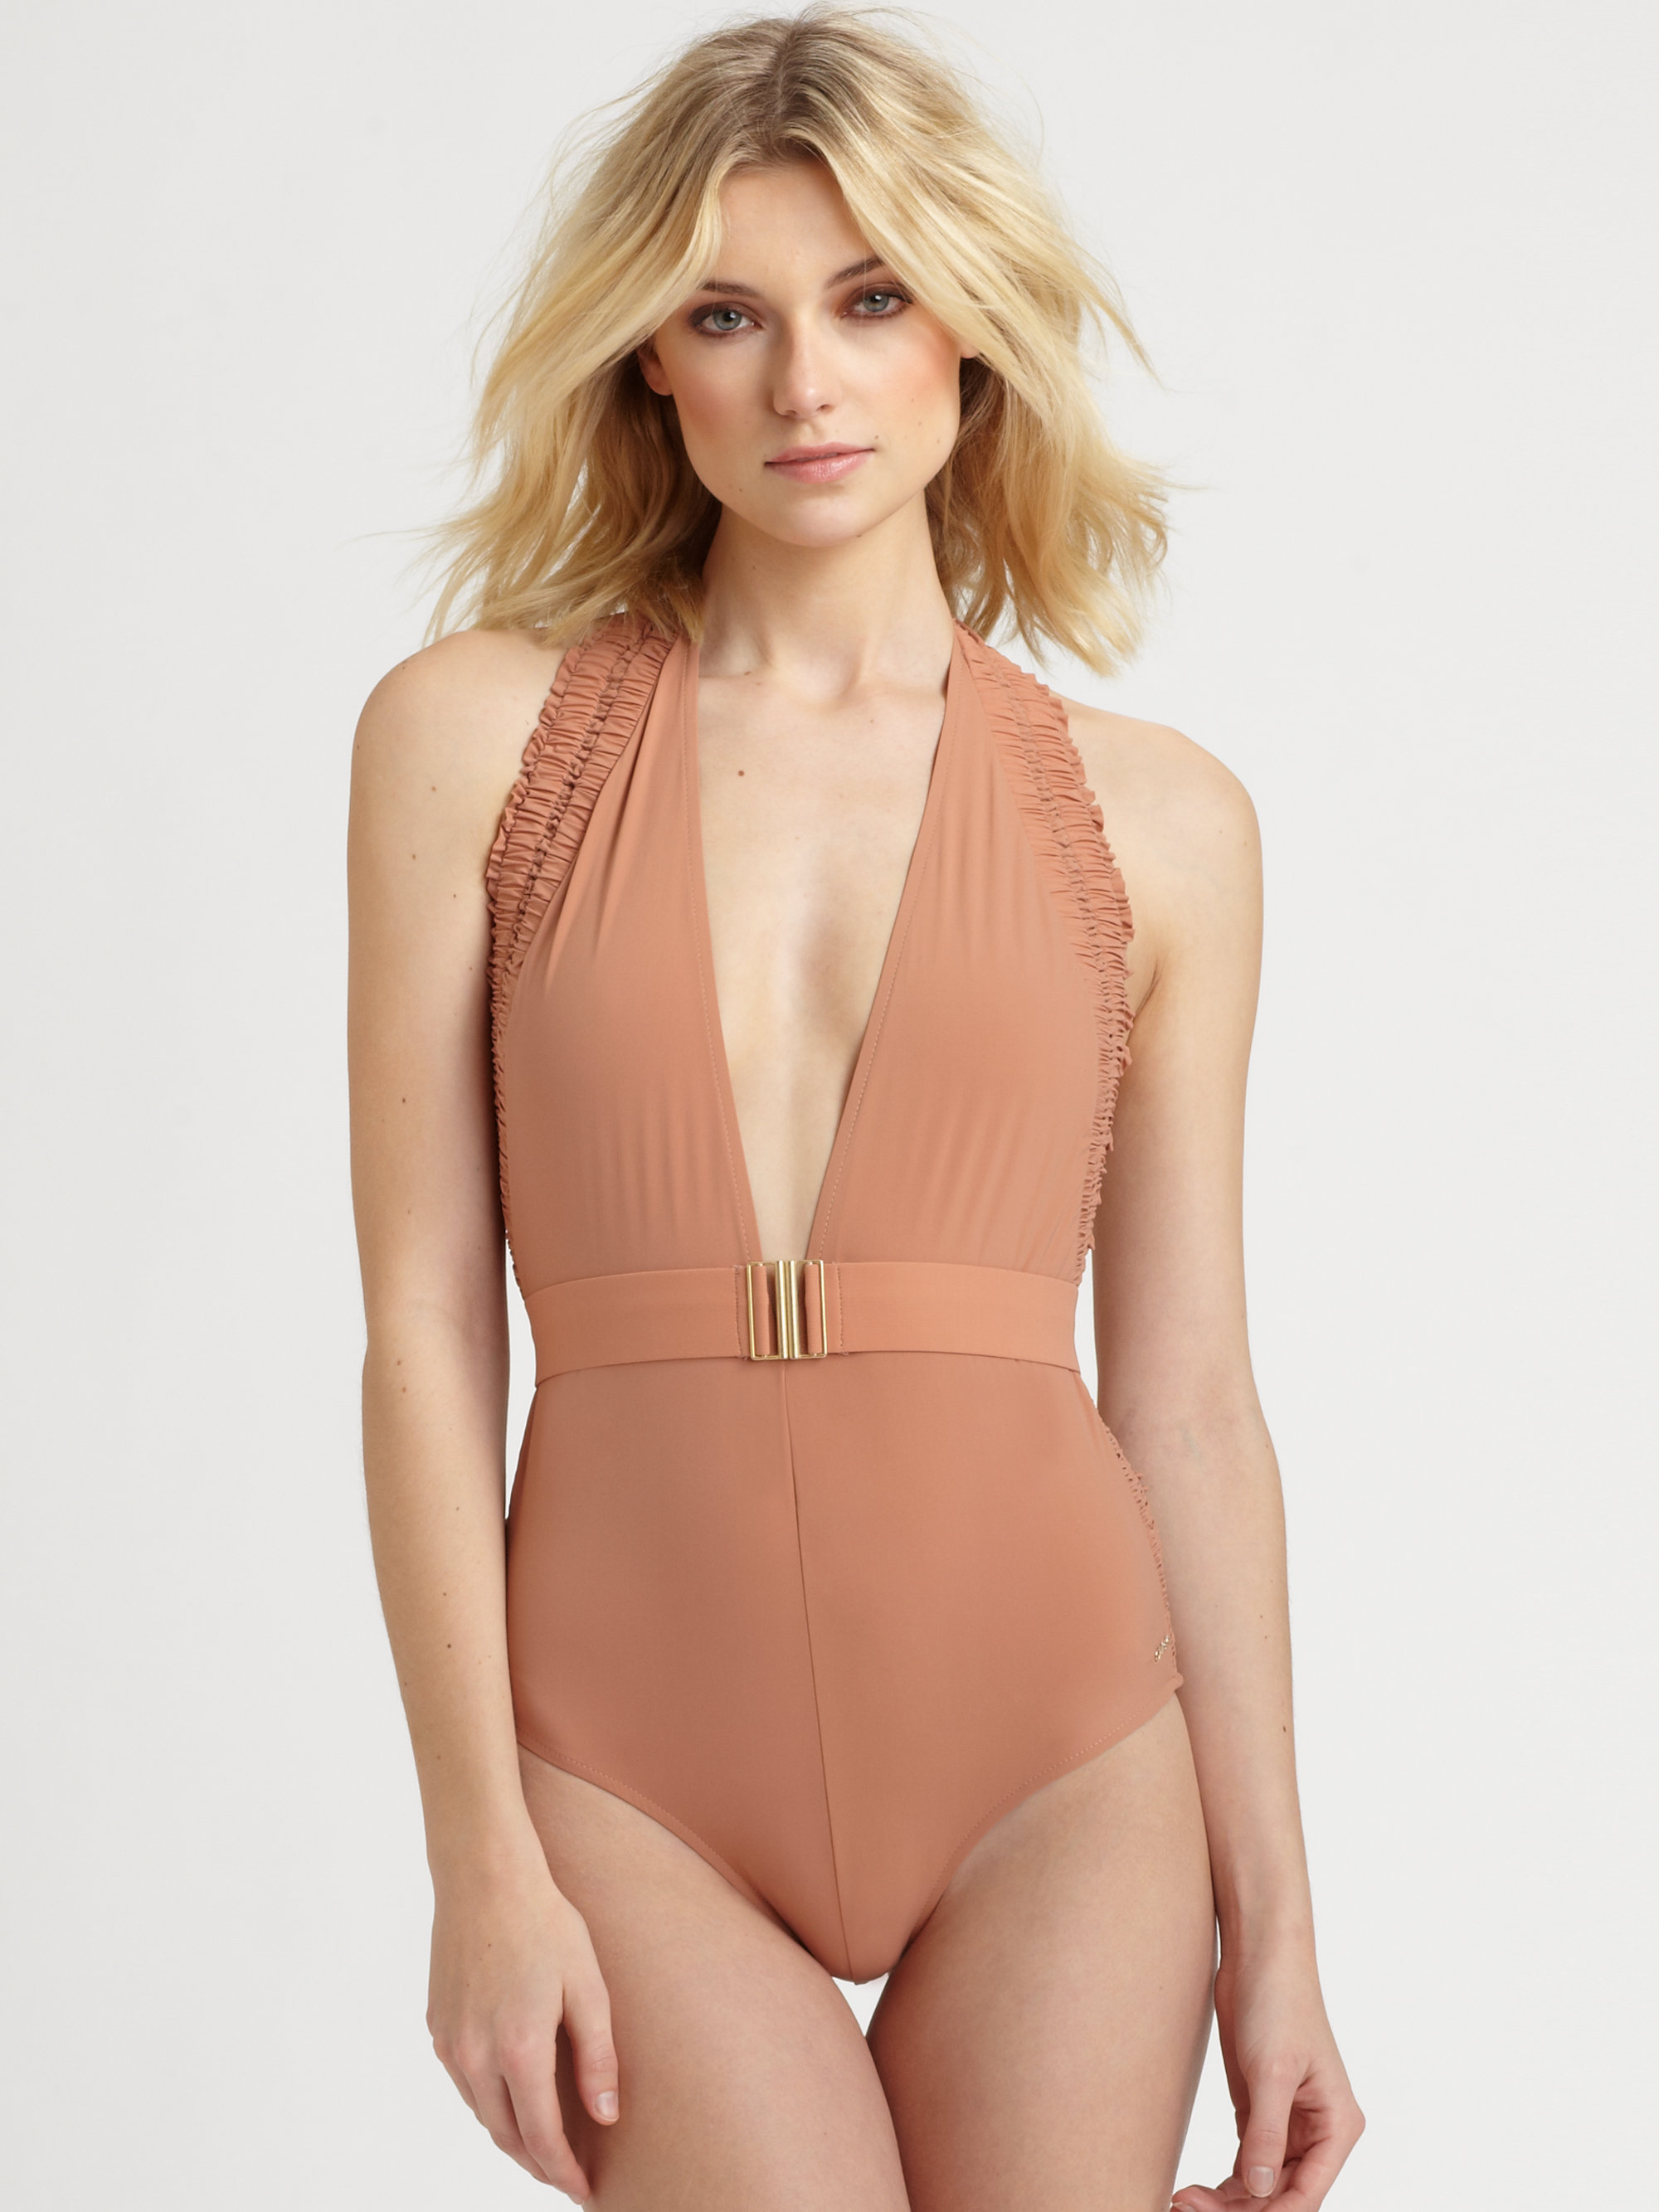 porn adult one piece swimsuit